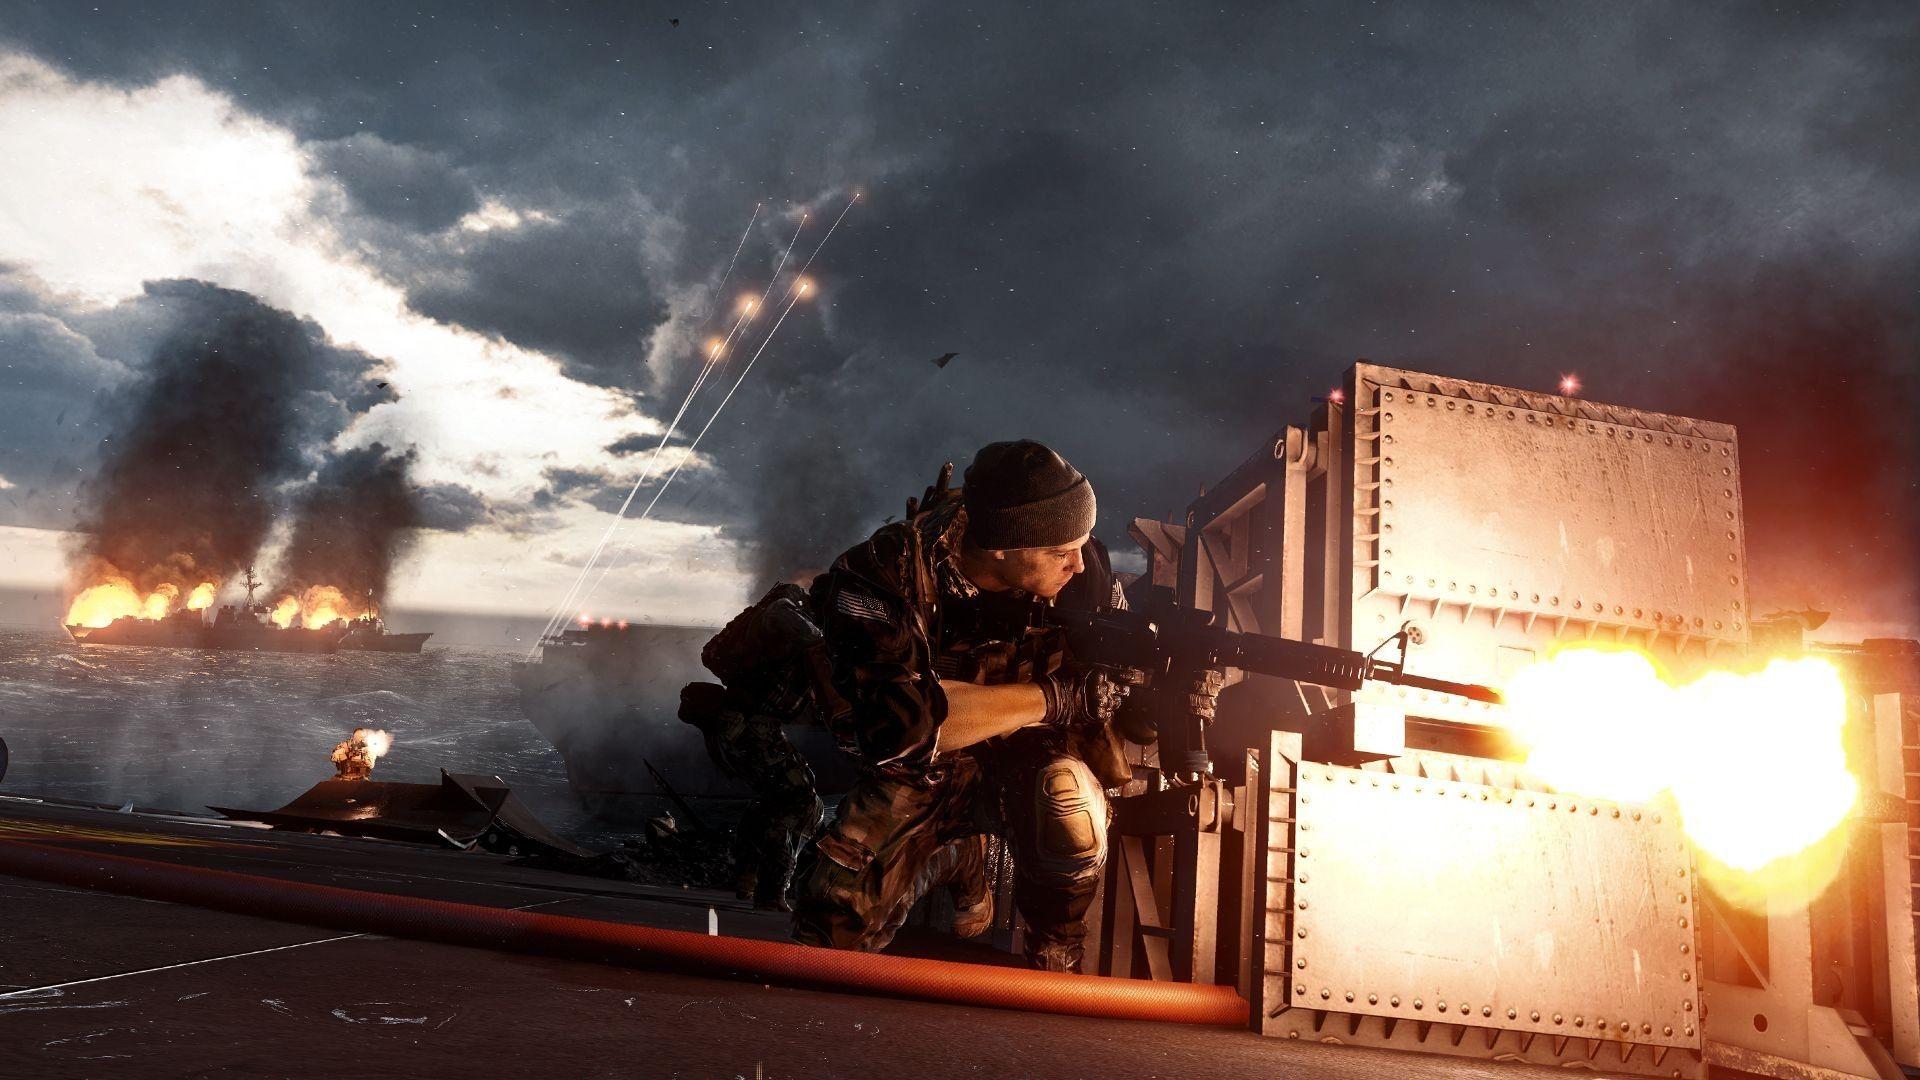 Battlefield 4 (PS4) - 12